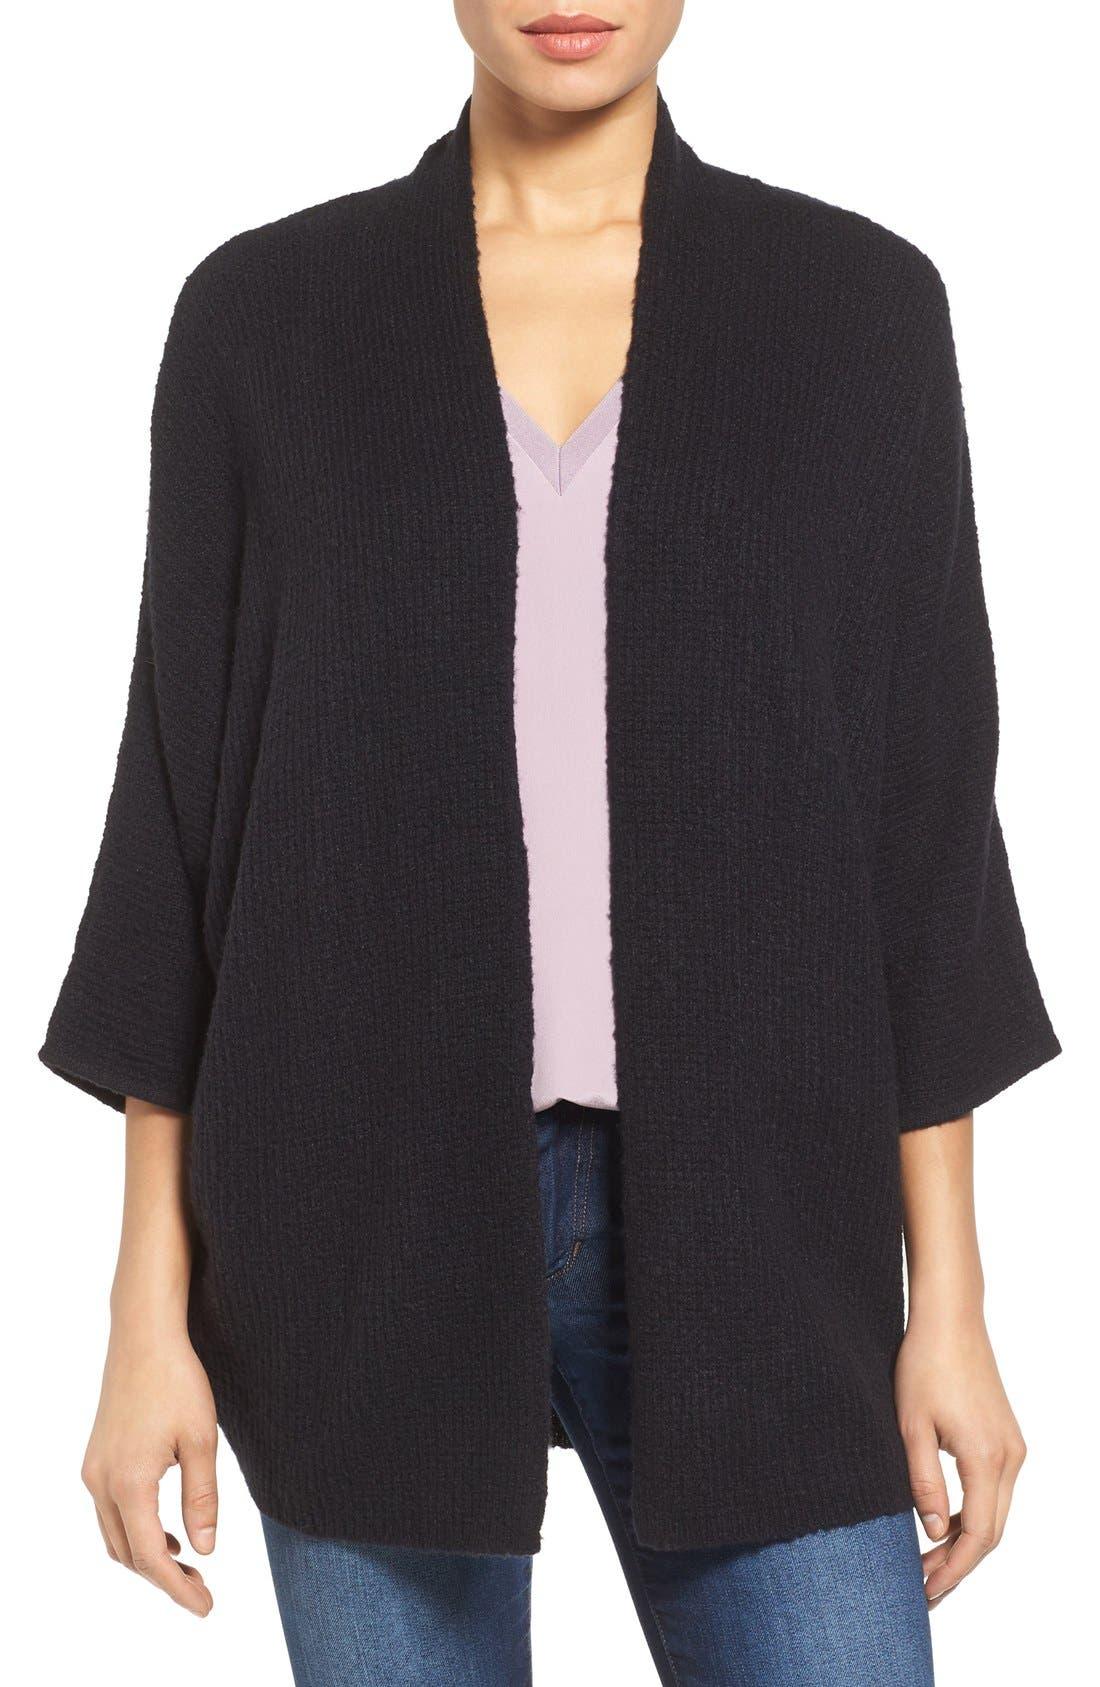 Alternate Image 1 Selected - Halogen® Open Front Knit Cardigan